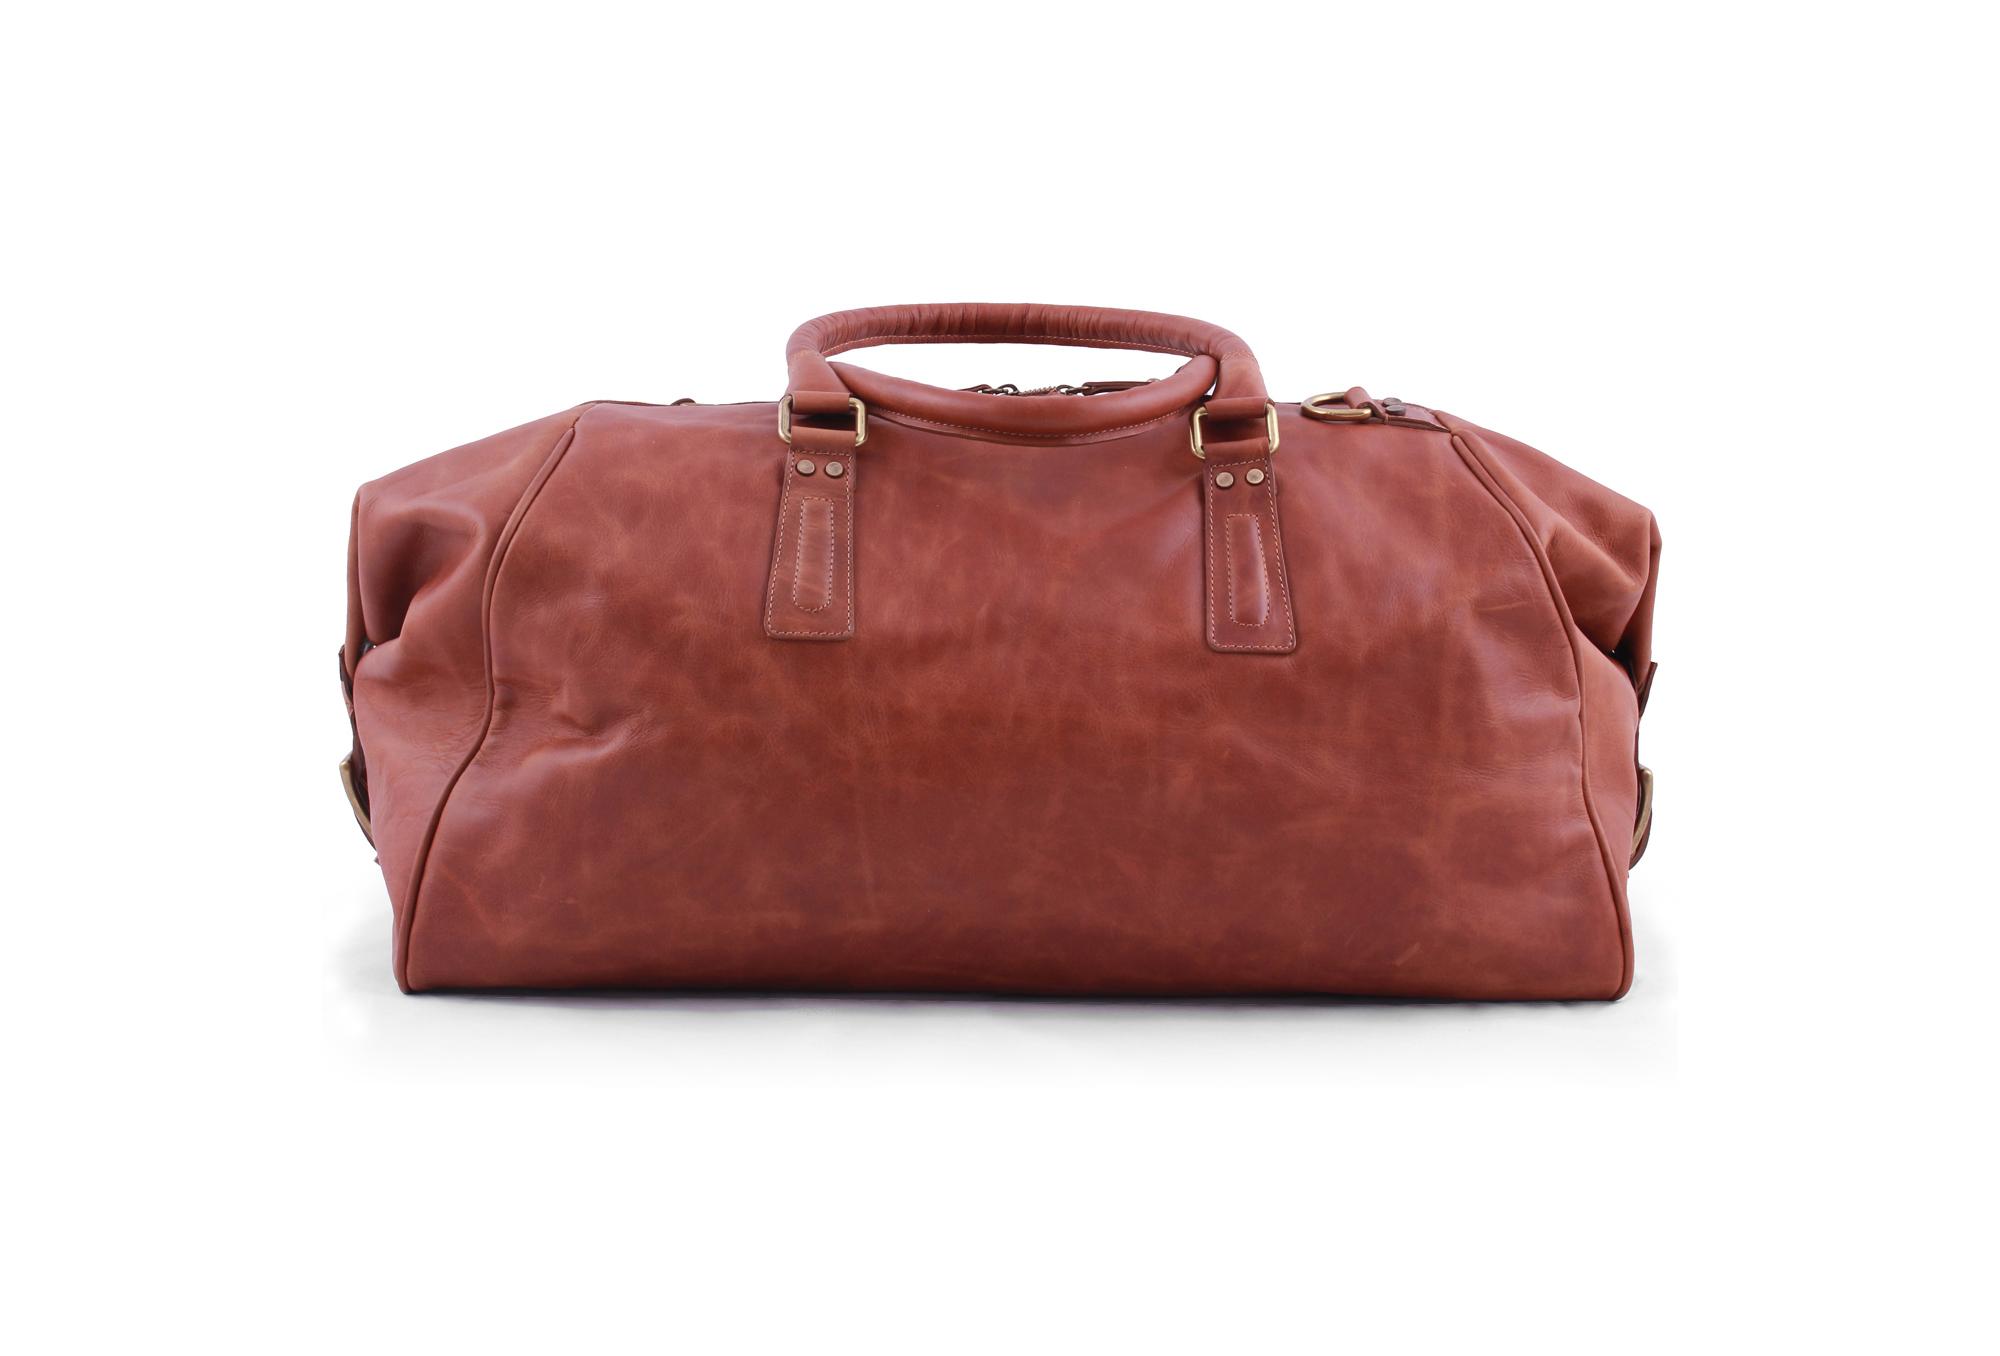 pampa puro suela leather large duffle bag